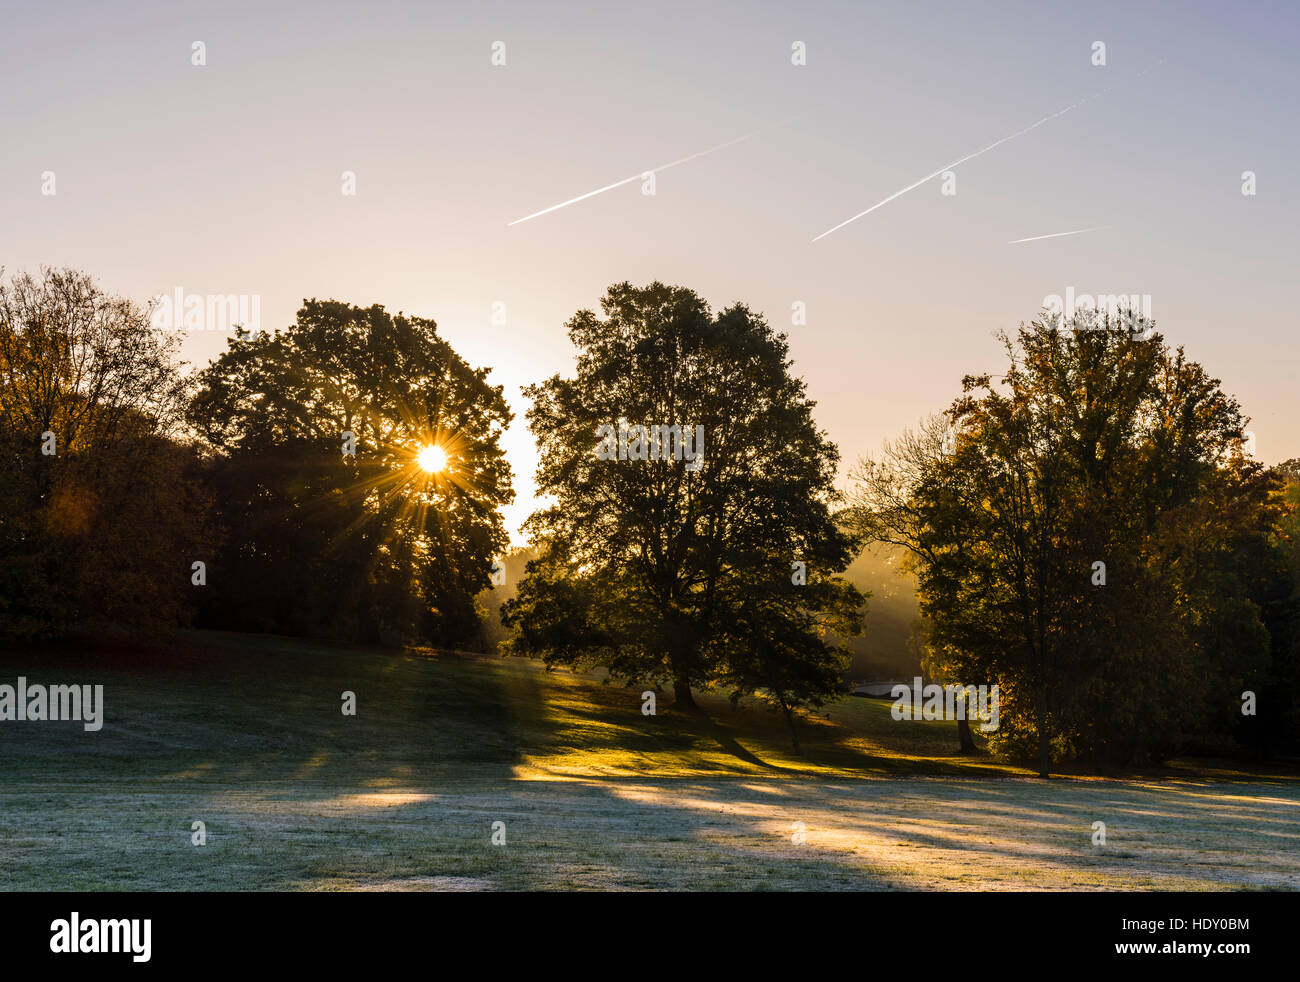 Early morning sunrise captured through trees on Hampstead Heath, London, UK - Stock Image